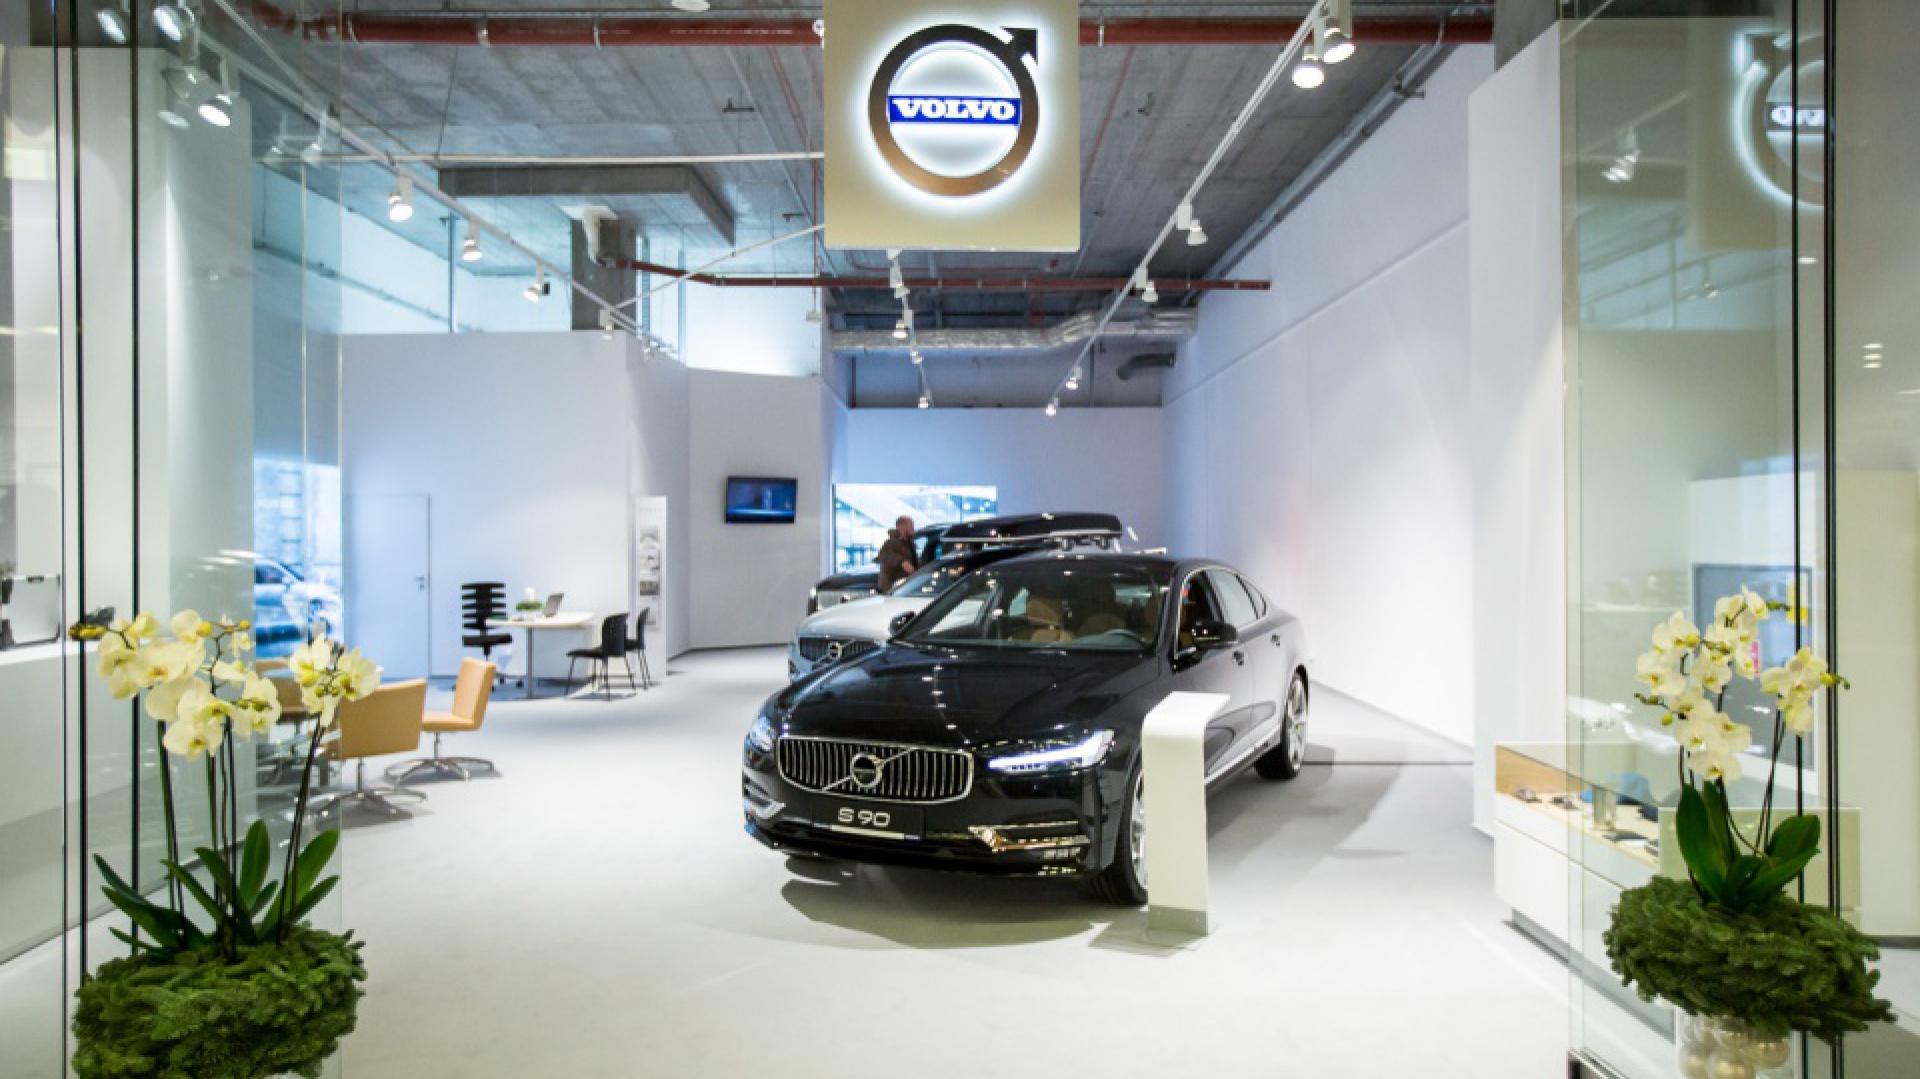 Showroom firma Karlik i marka Volvo, fot. J. Wittchen